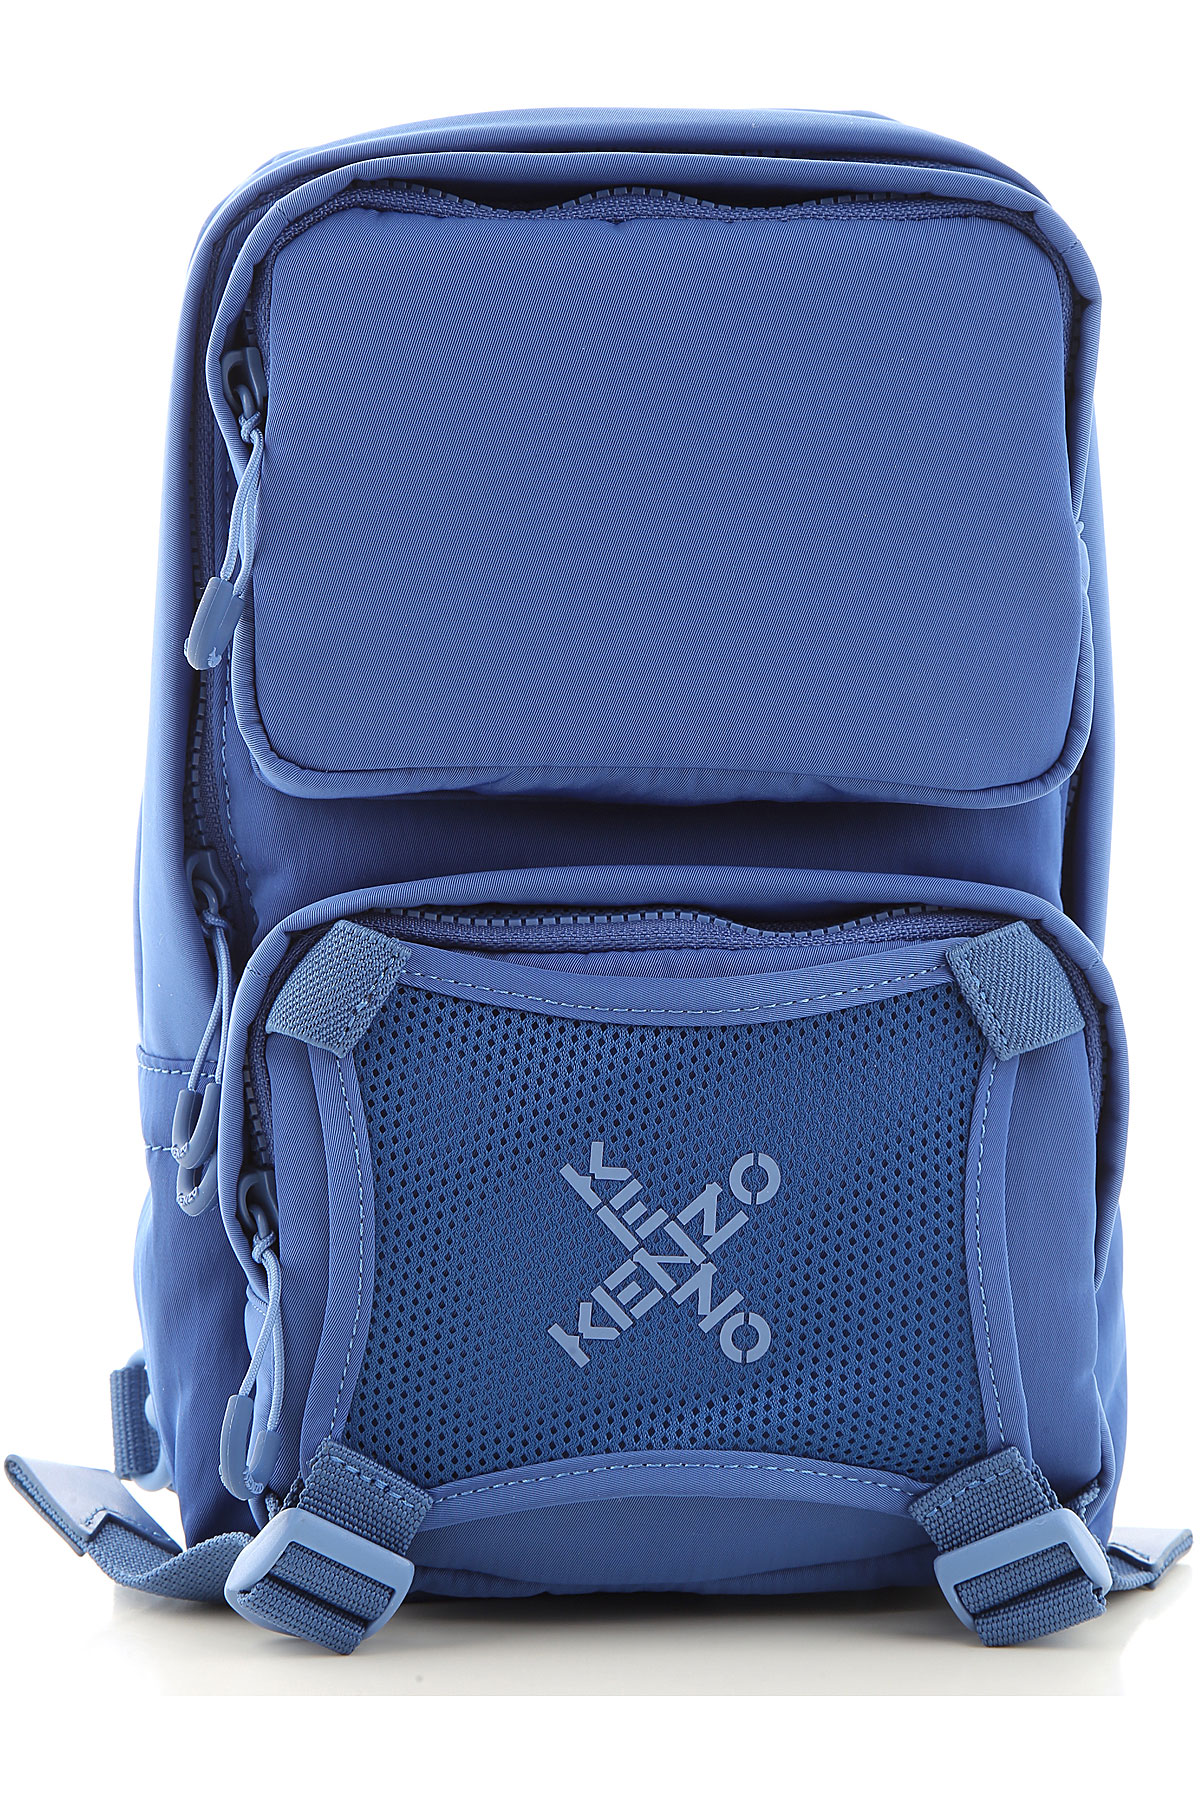 Kenzo Backpack for Women, Cobalt, Fabric, 2019